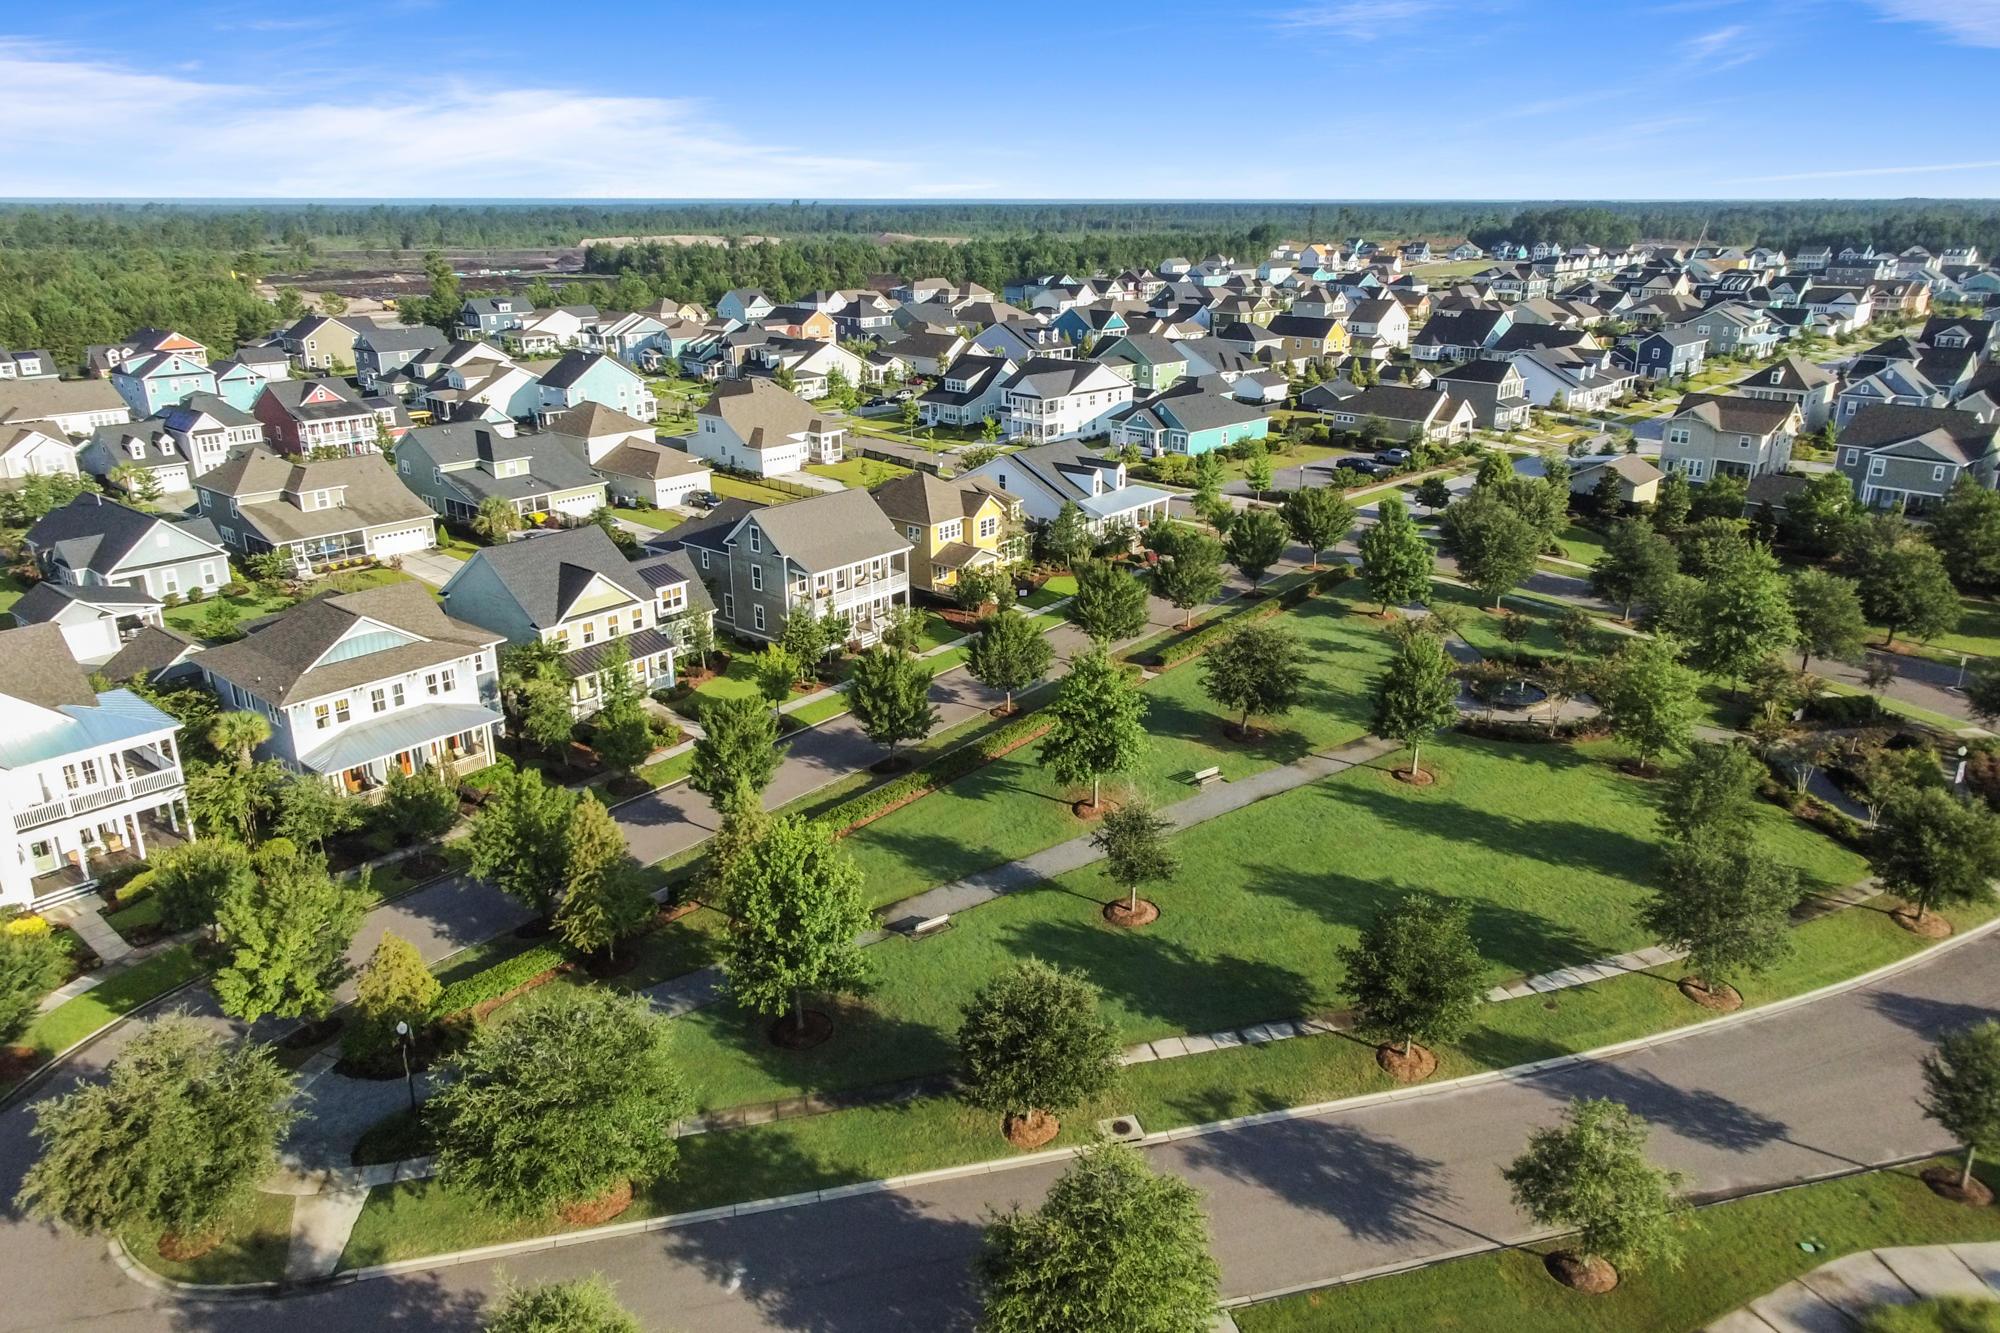 Carnes Crossroads Homes For Sale - 185 Callibluff, Summerville, SC - 2